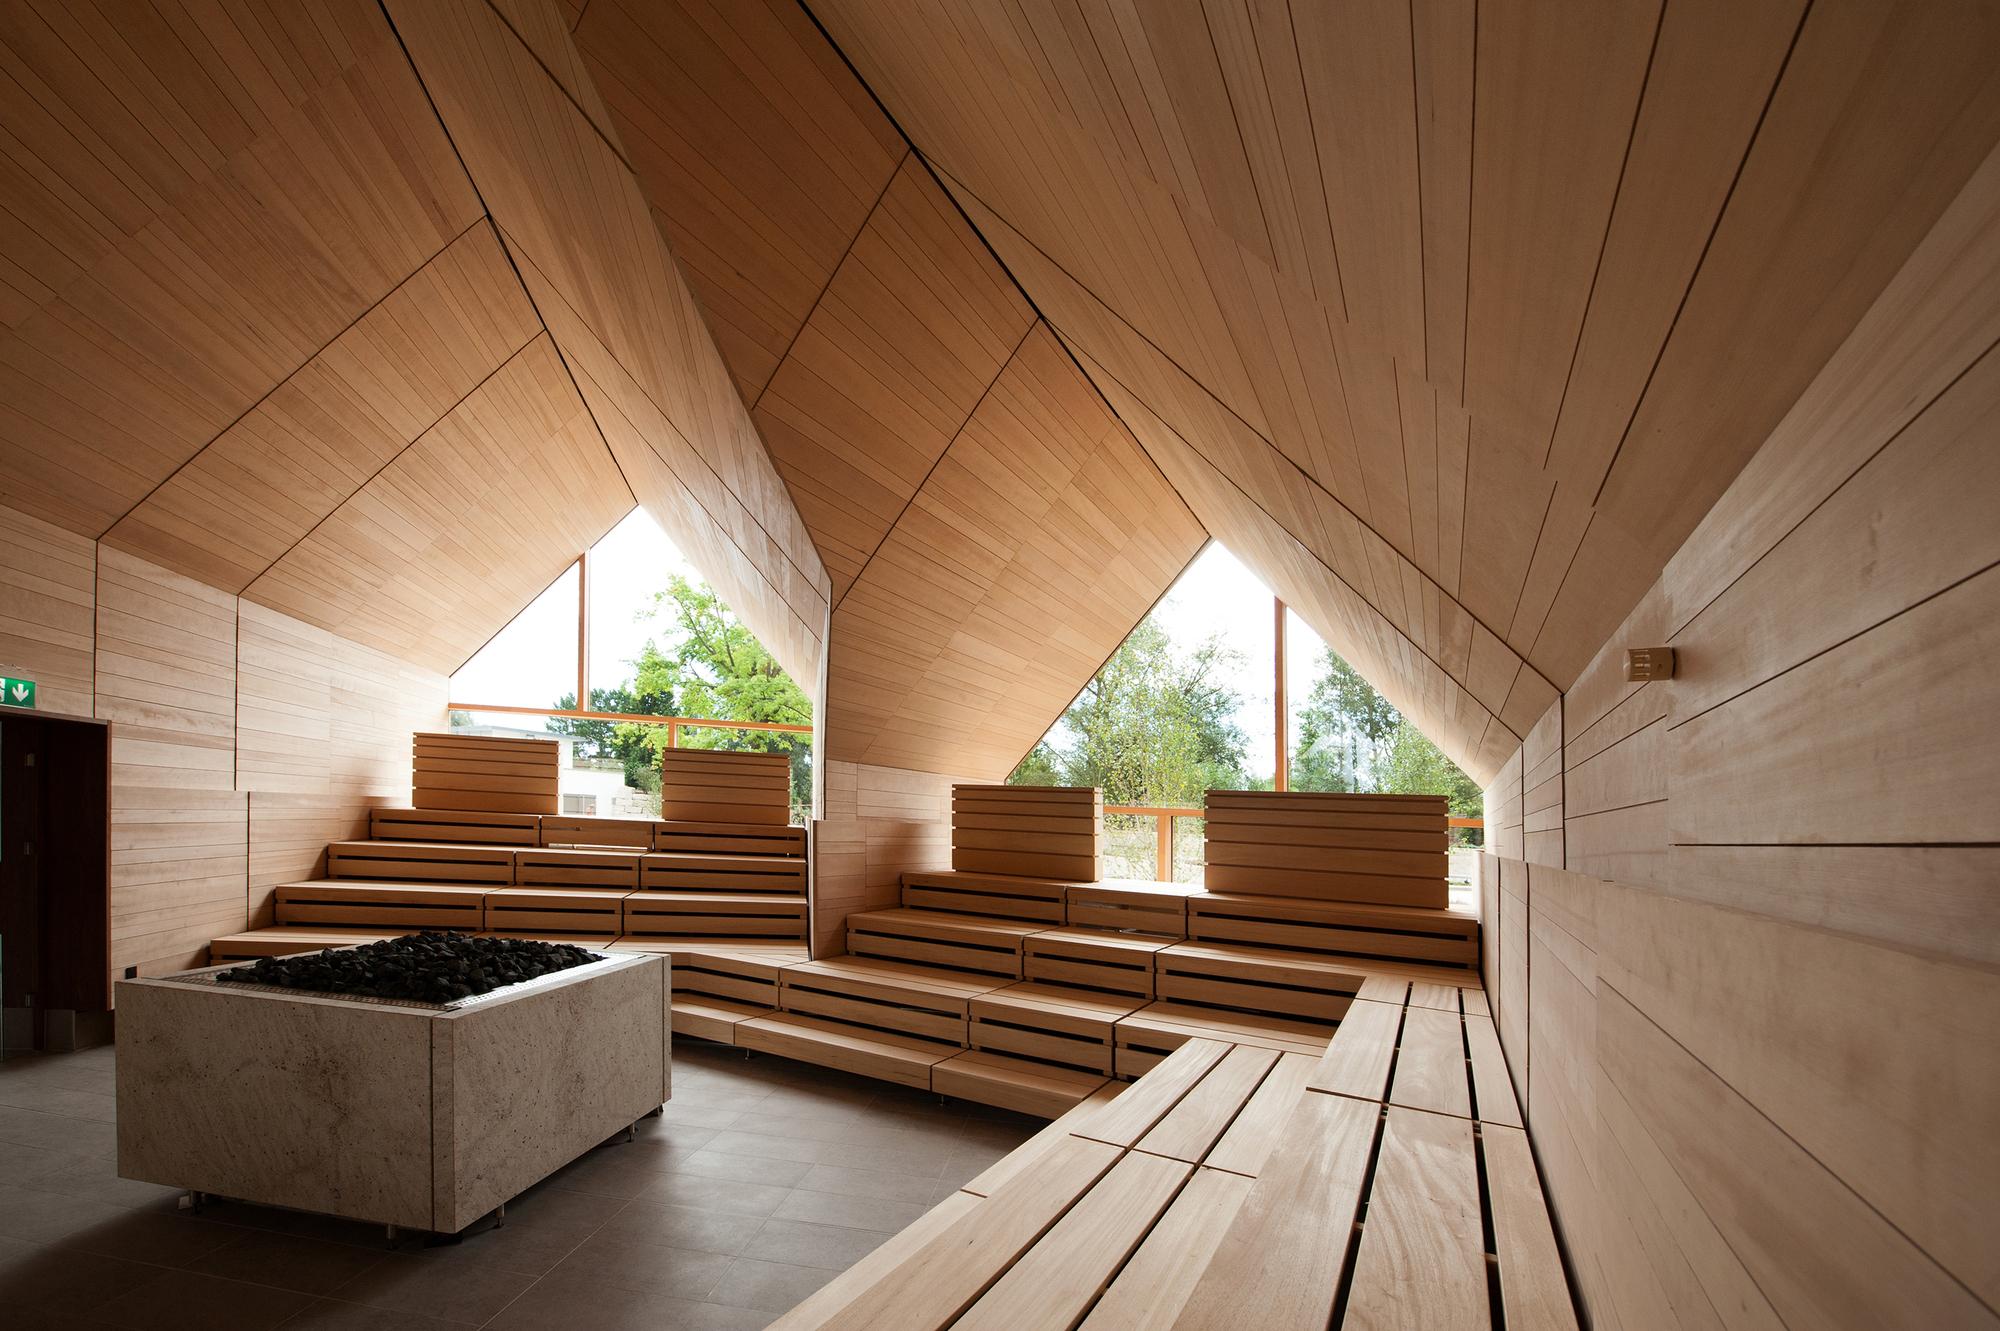 Jordanbad Sauna Village Jeschke ArchitekturampPlanung